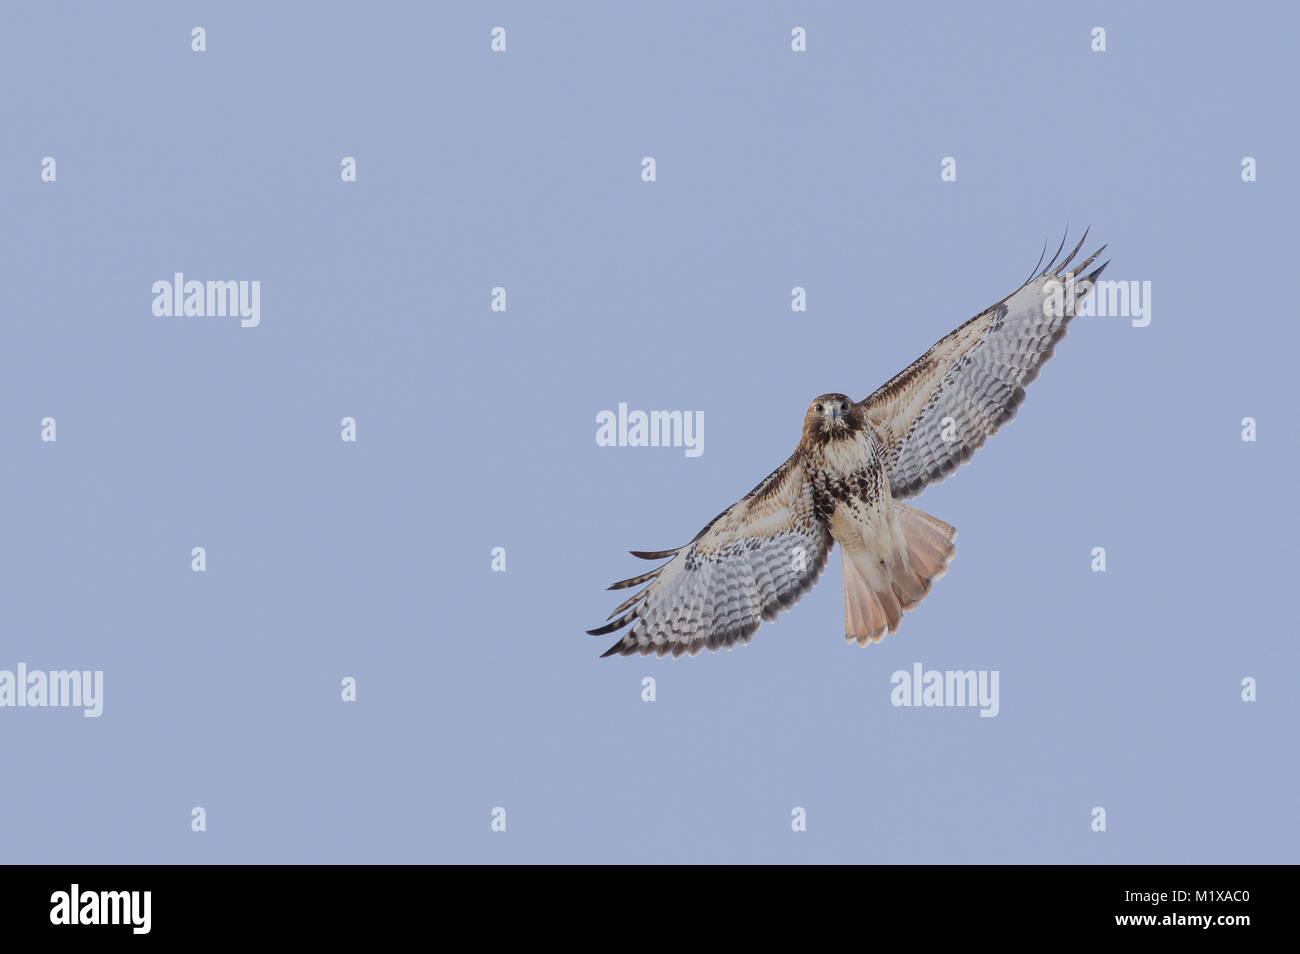 Abieticola subspecies of Red-tailed Hawk in flight. - Stock Image